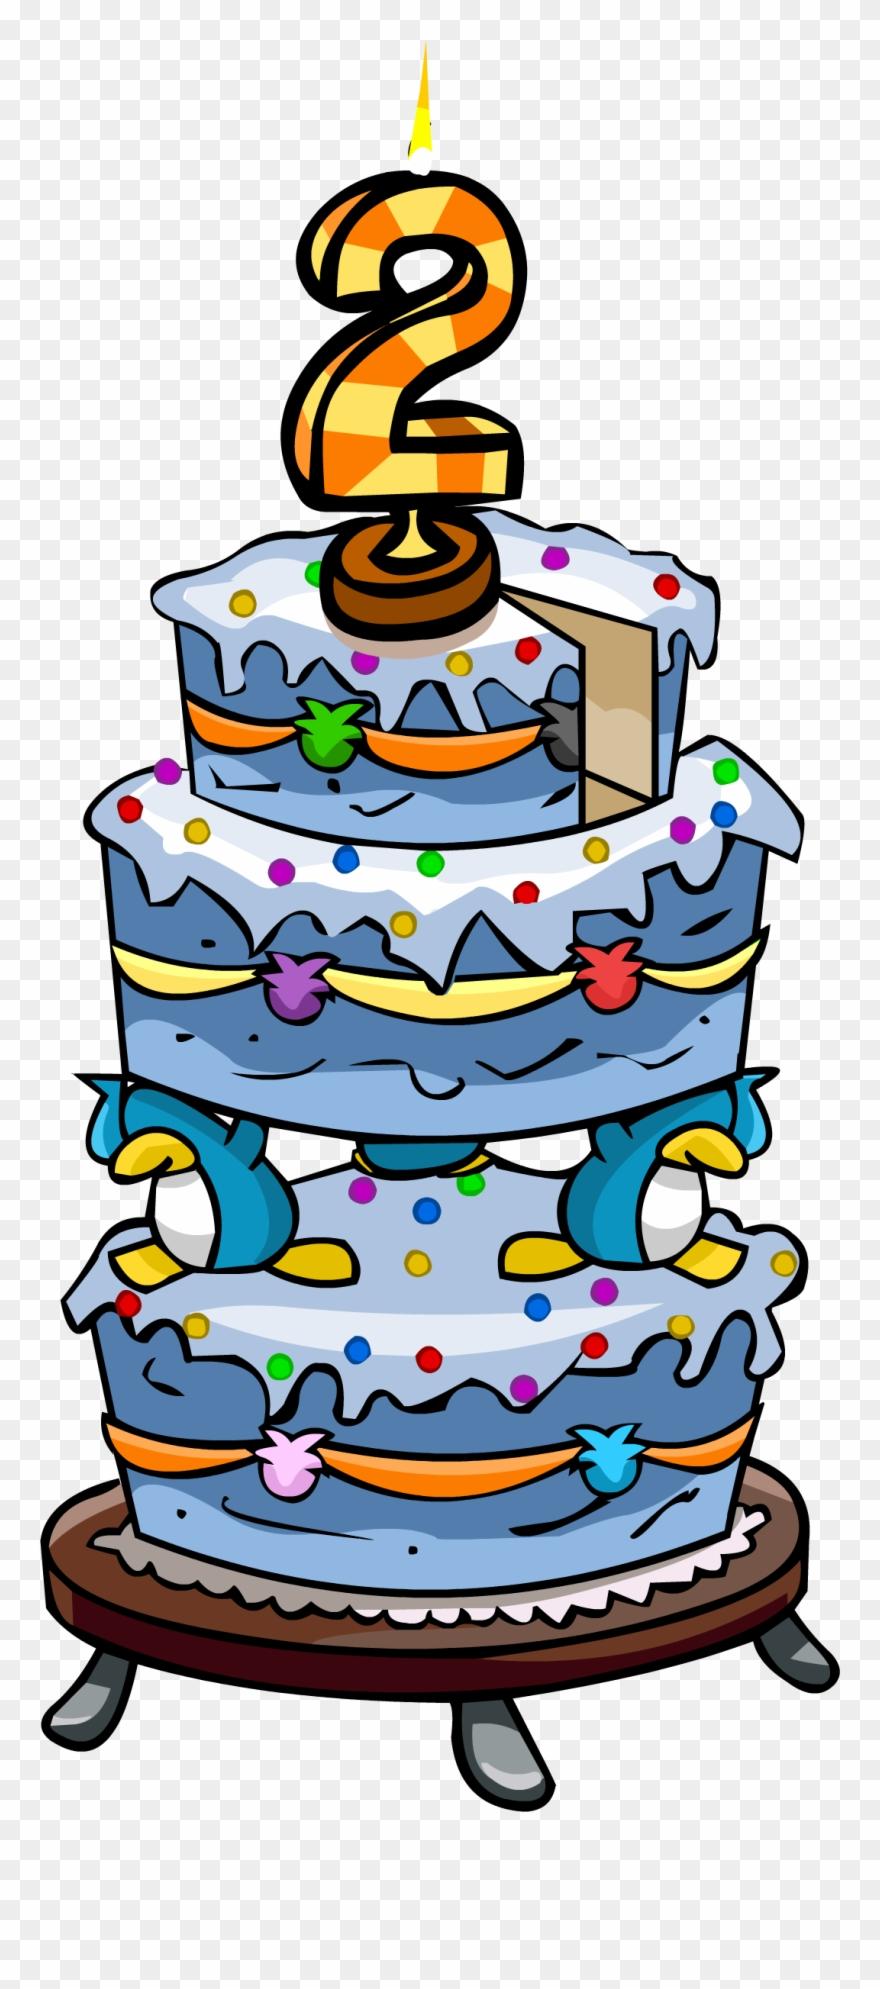 Sensational Library Of 2 Nd Birthday Cake Image Transparent Files Funny Birthday Cards Online Benoljebrpdamsfinfo